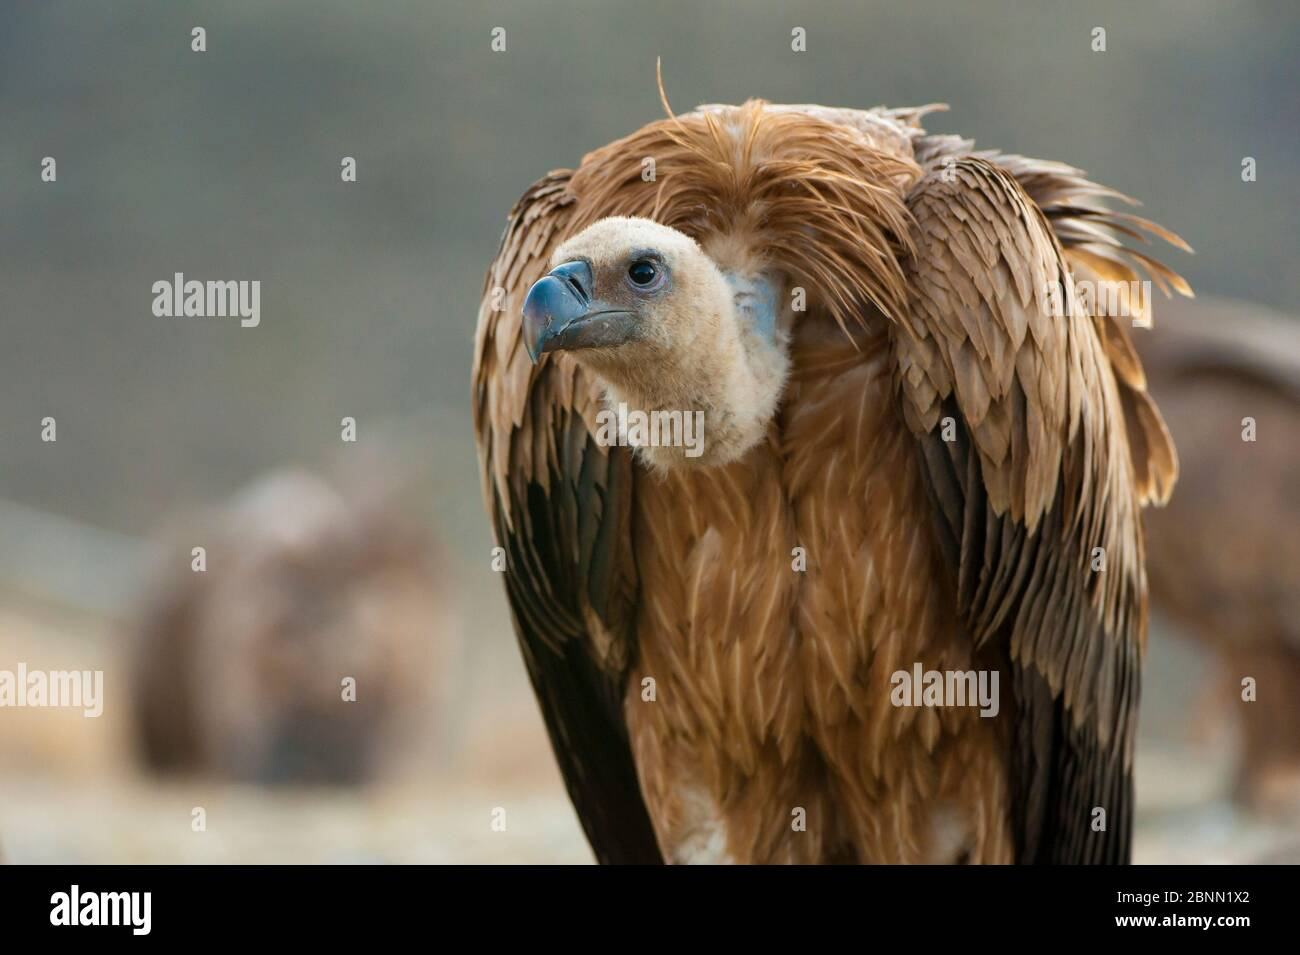 Griffon Vulture (Gyps fulvus), Pirenei, Spagna. Foto Stock